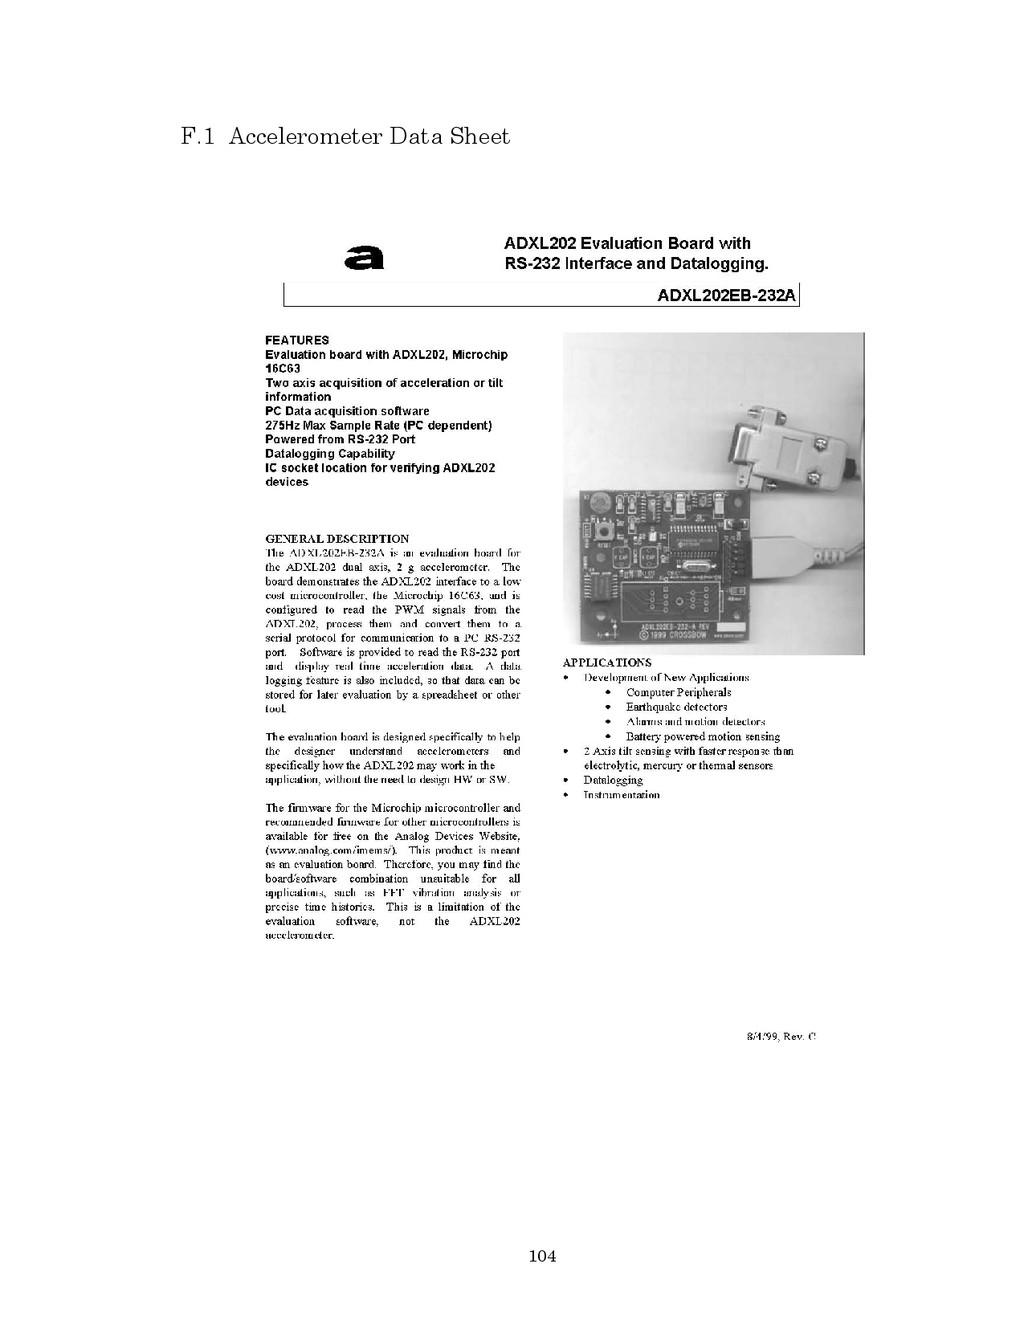 104 F.1 Accelerometer Data Sheet